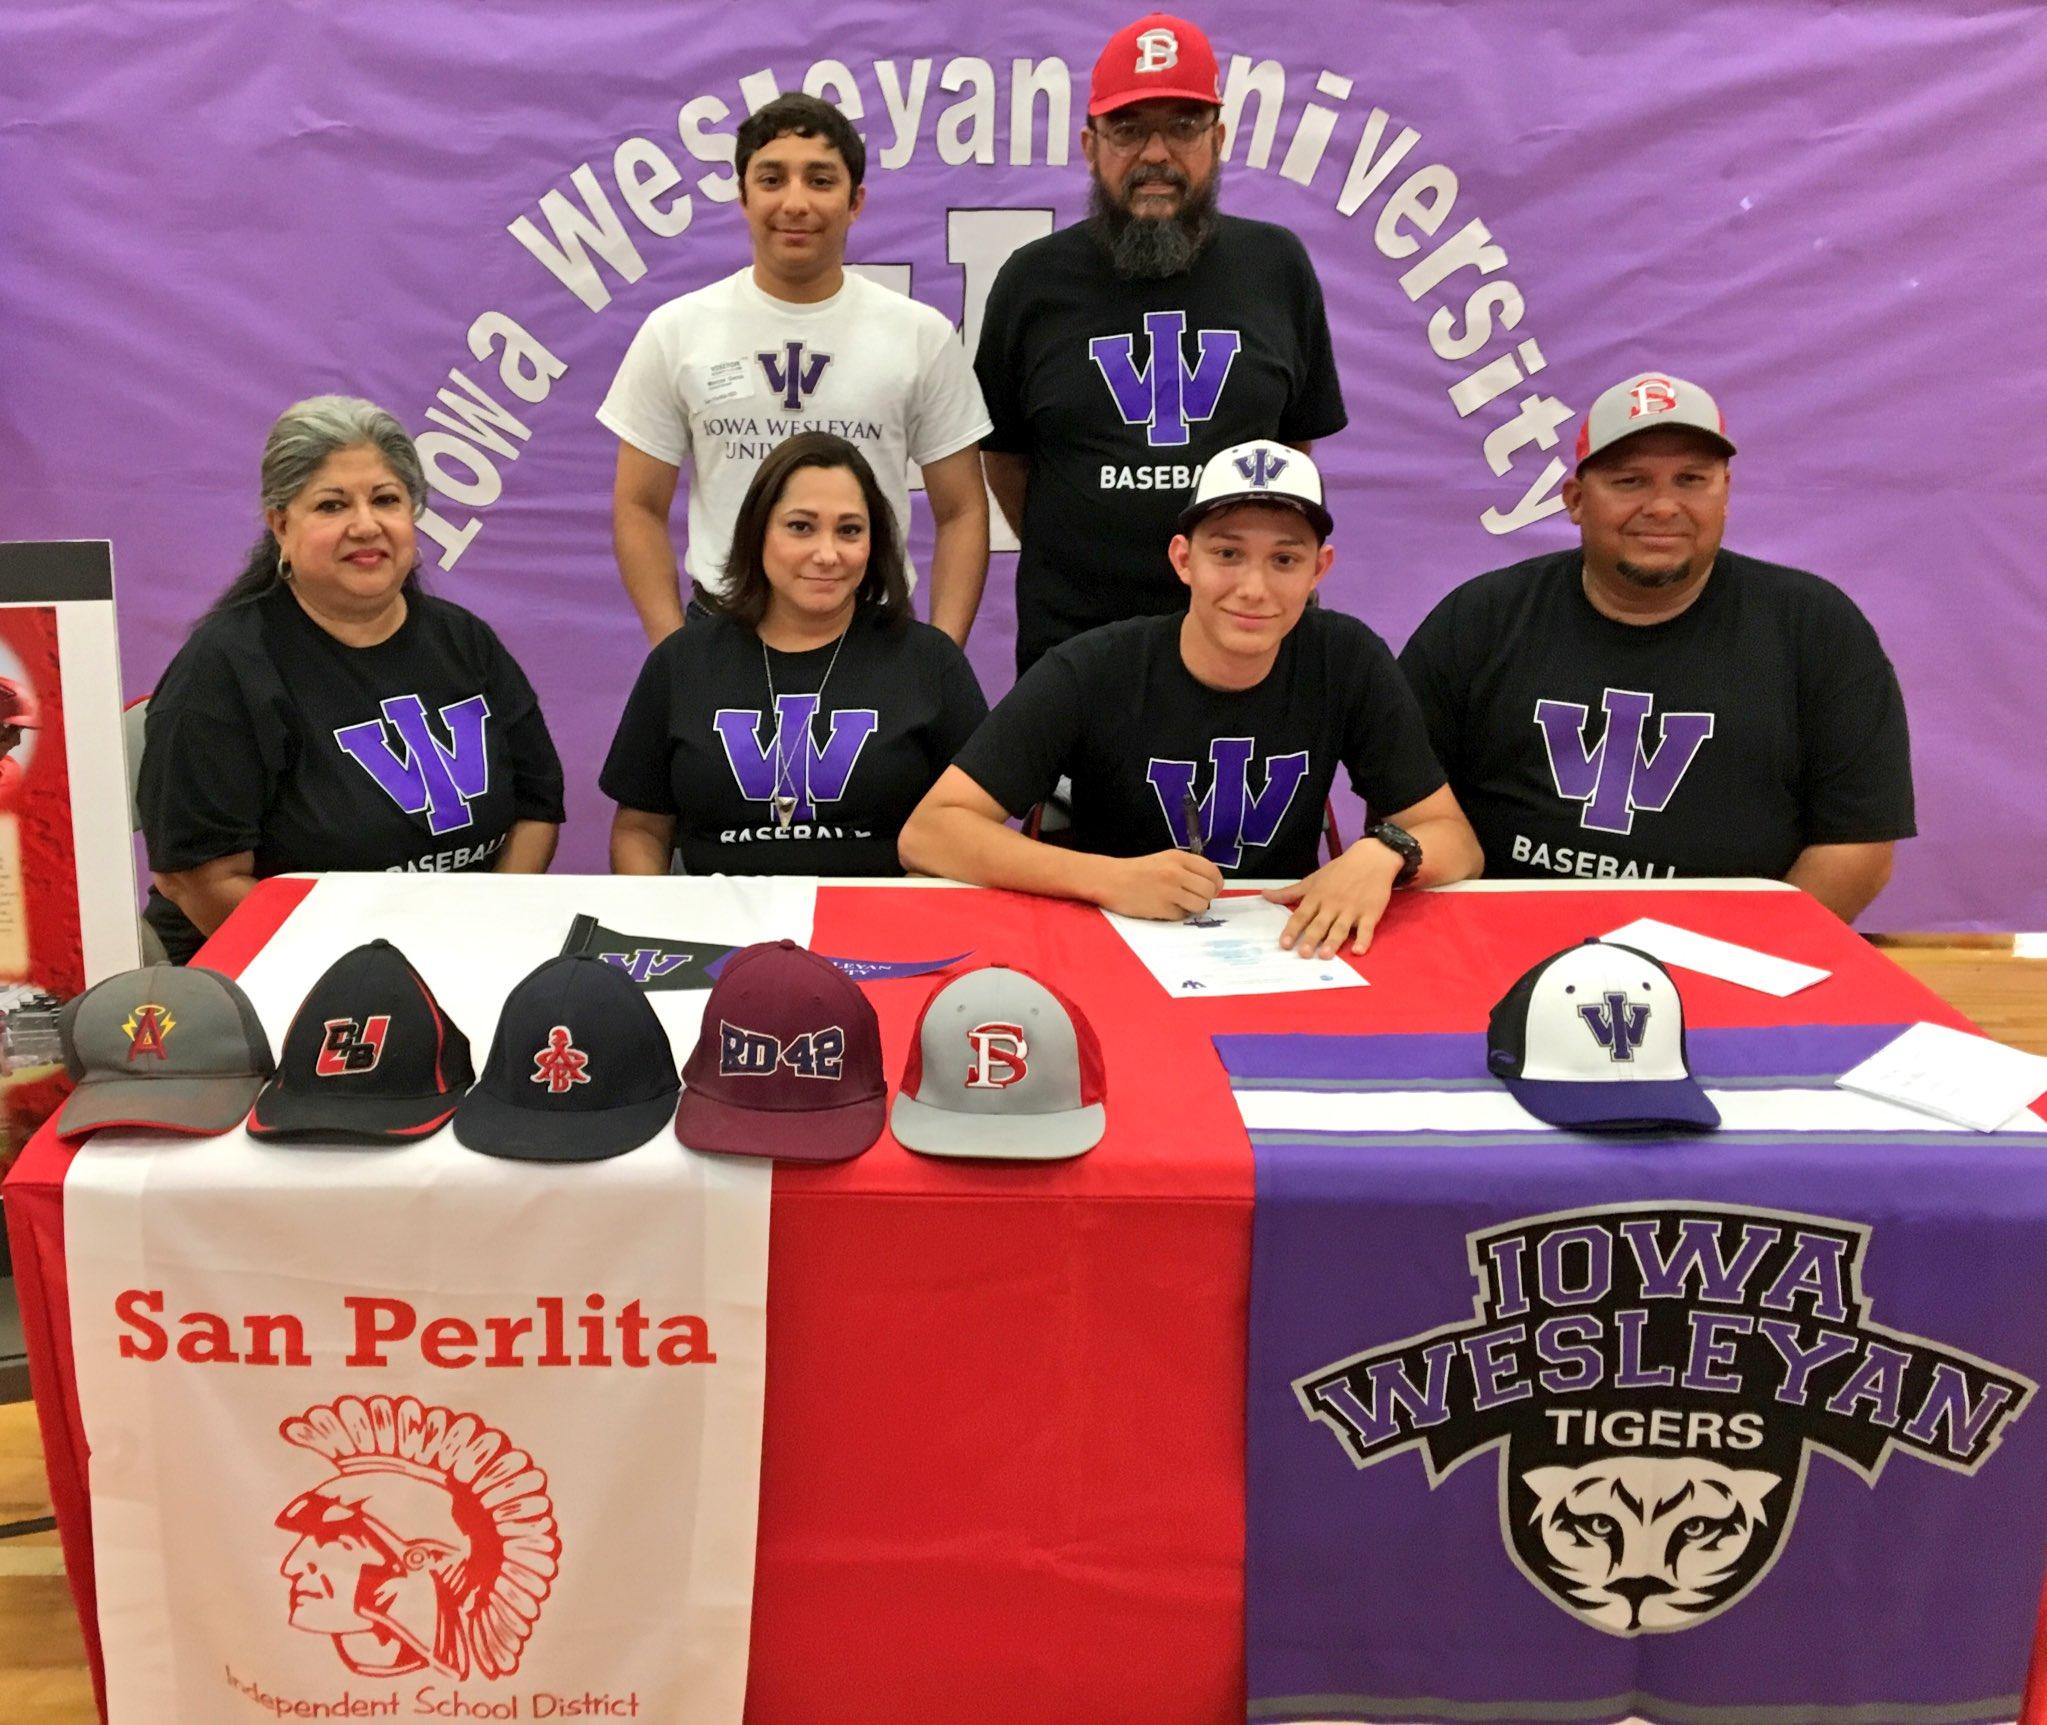 Clay Williams On Twitter San Perlita Catcher Daniel Garza Today Signs To Play Baseball For Iowa Wesleyan University In Mt Pleasant Ia Congrats Rgv Txhsbase Https T Co Yjygzm8idj